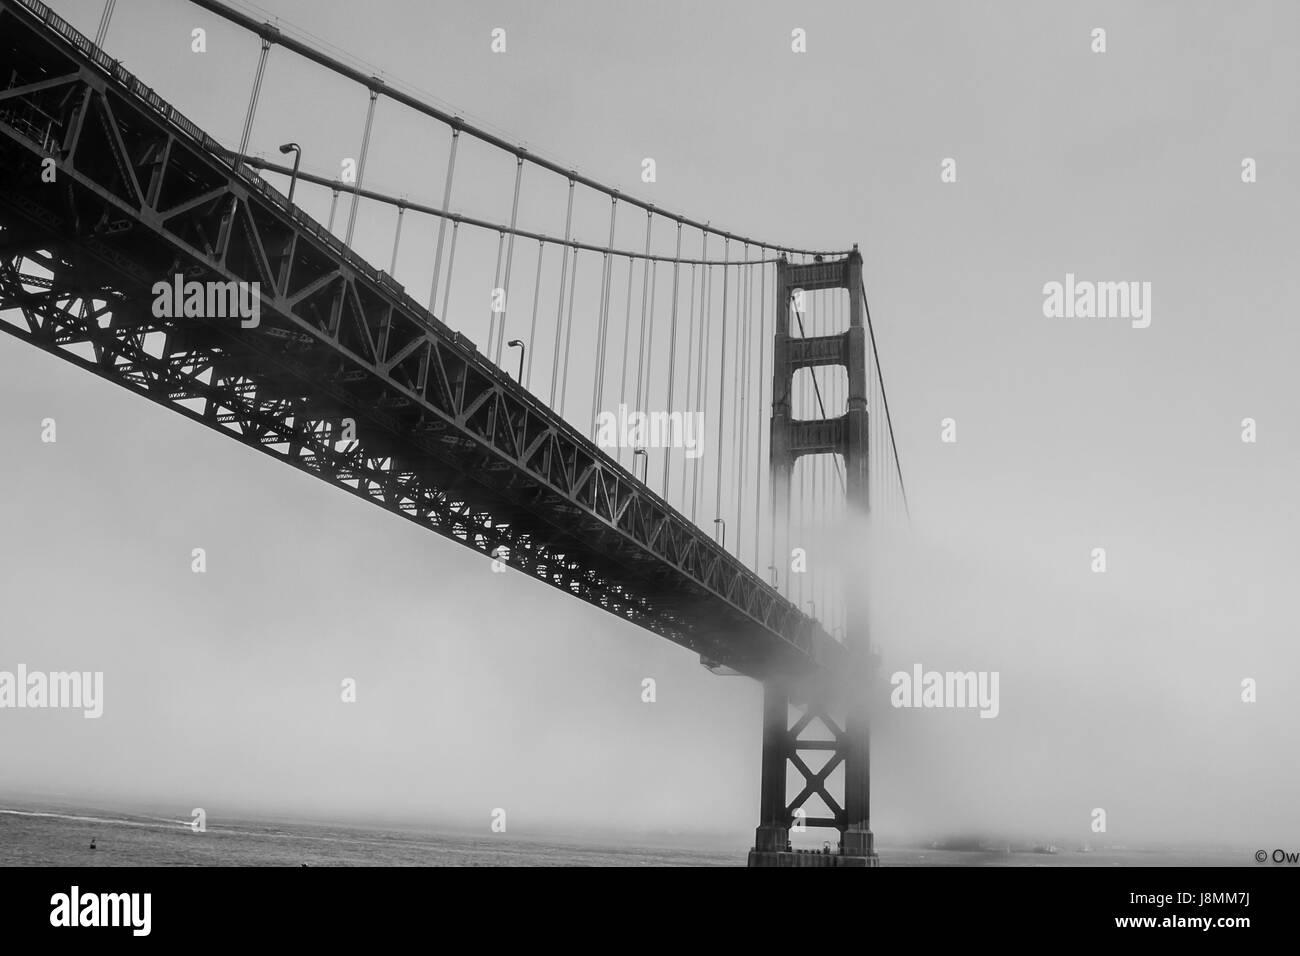 Golden Gate Bridge - San Francisco, California - Stock Image